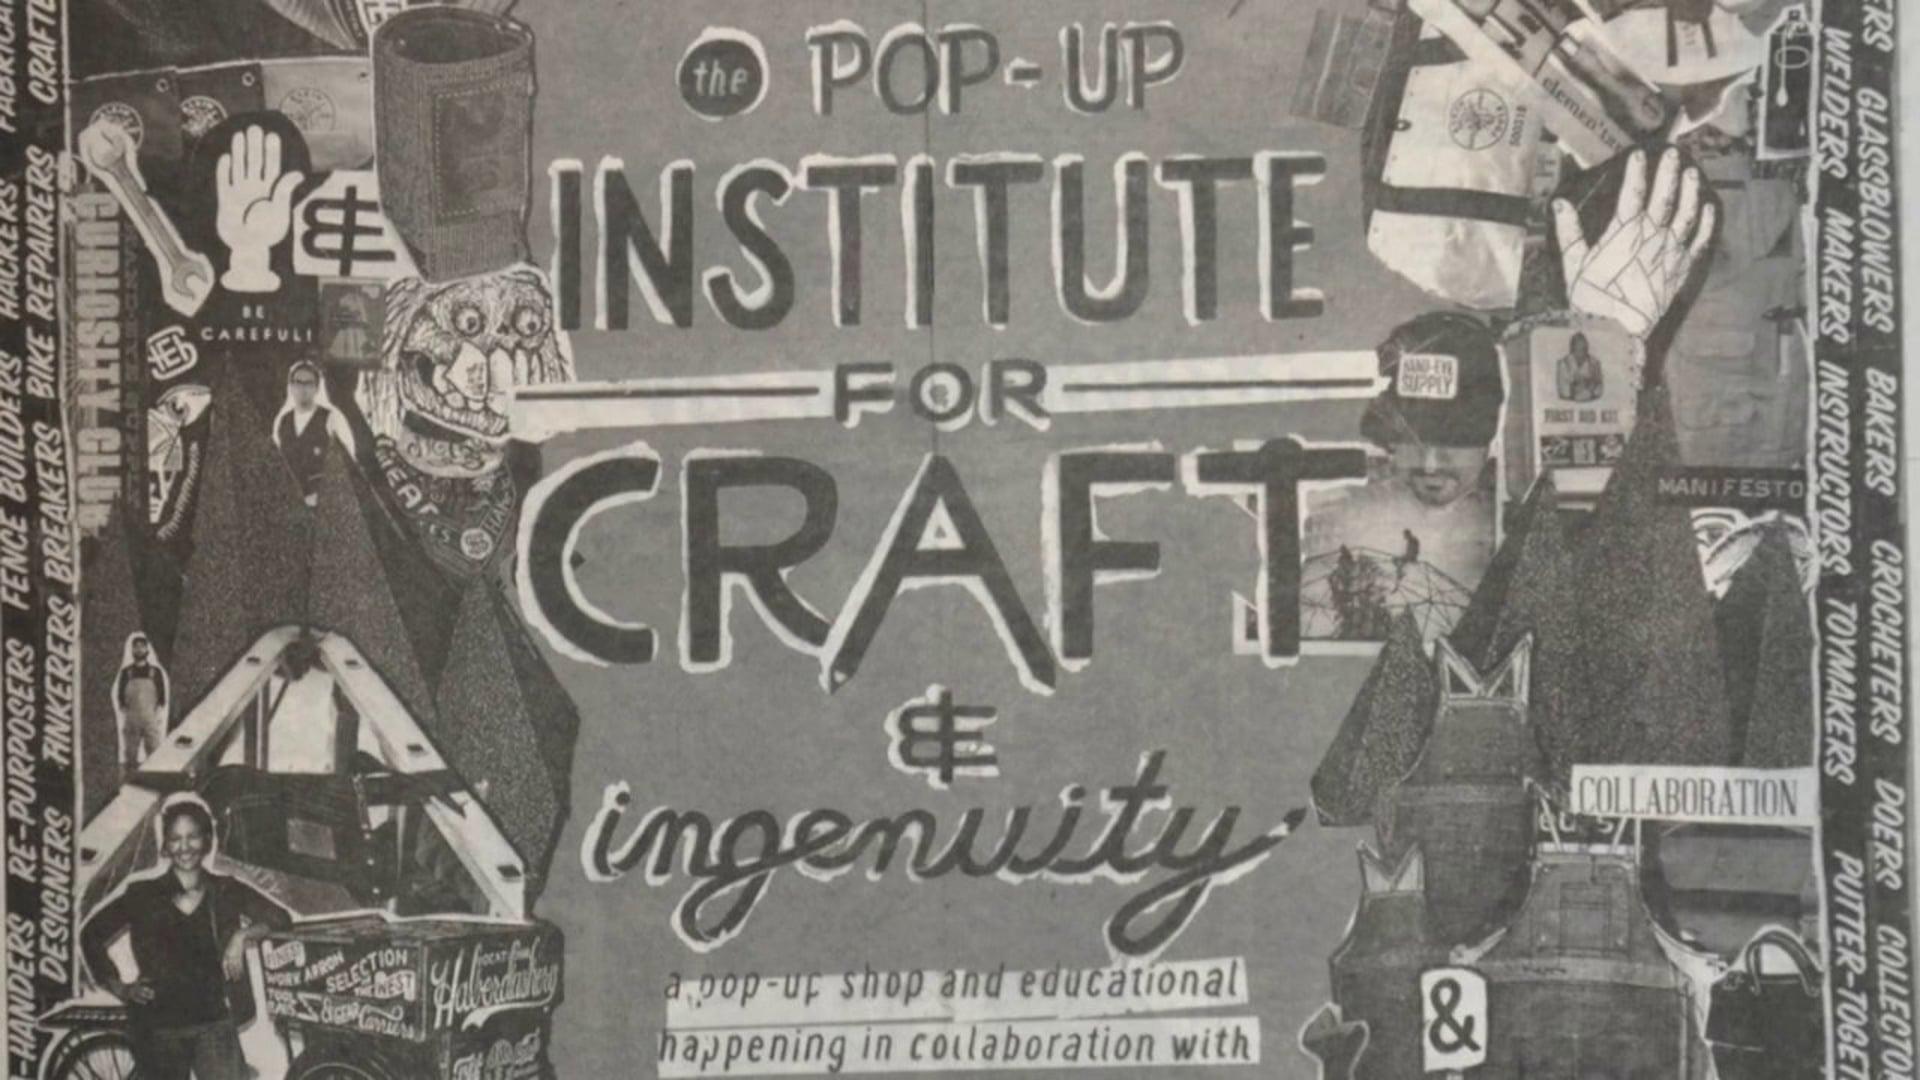 Hand-Eye Supply Pop-Up Institute for Craft & Ingenuity